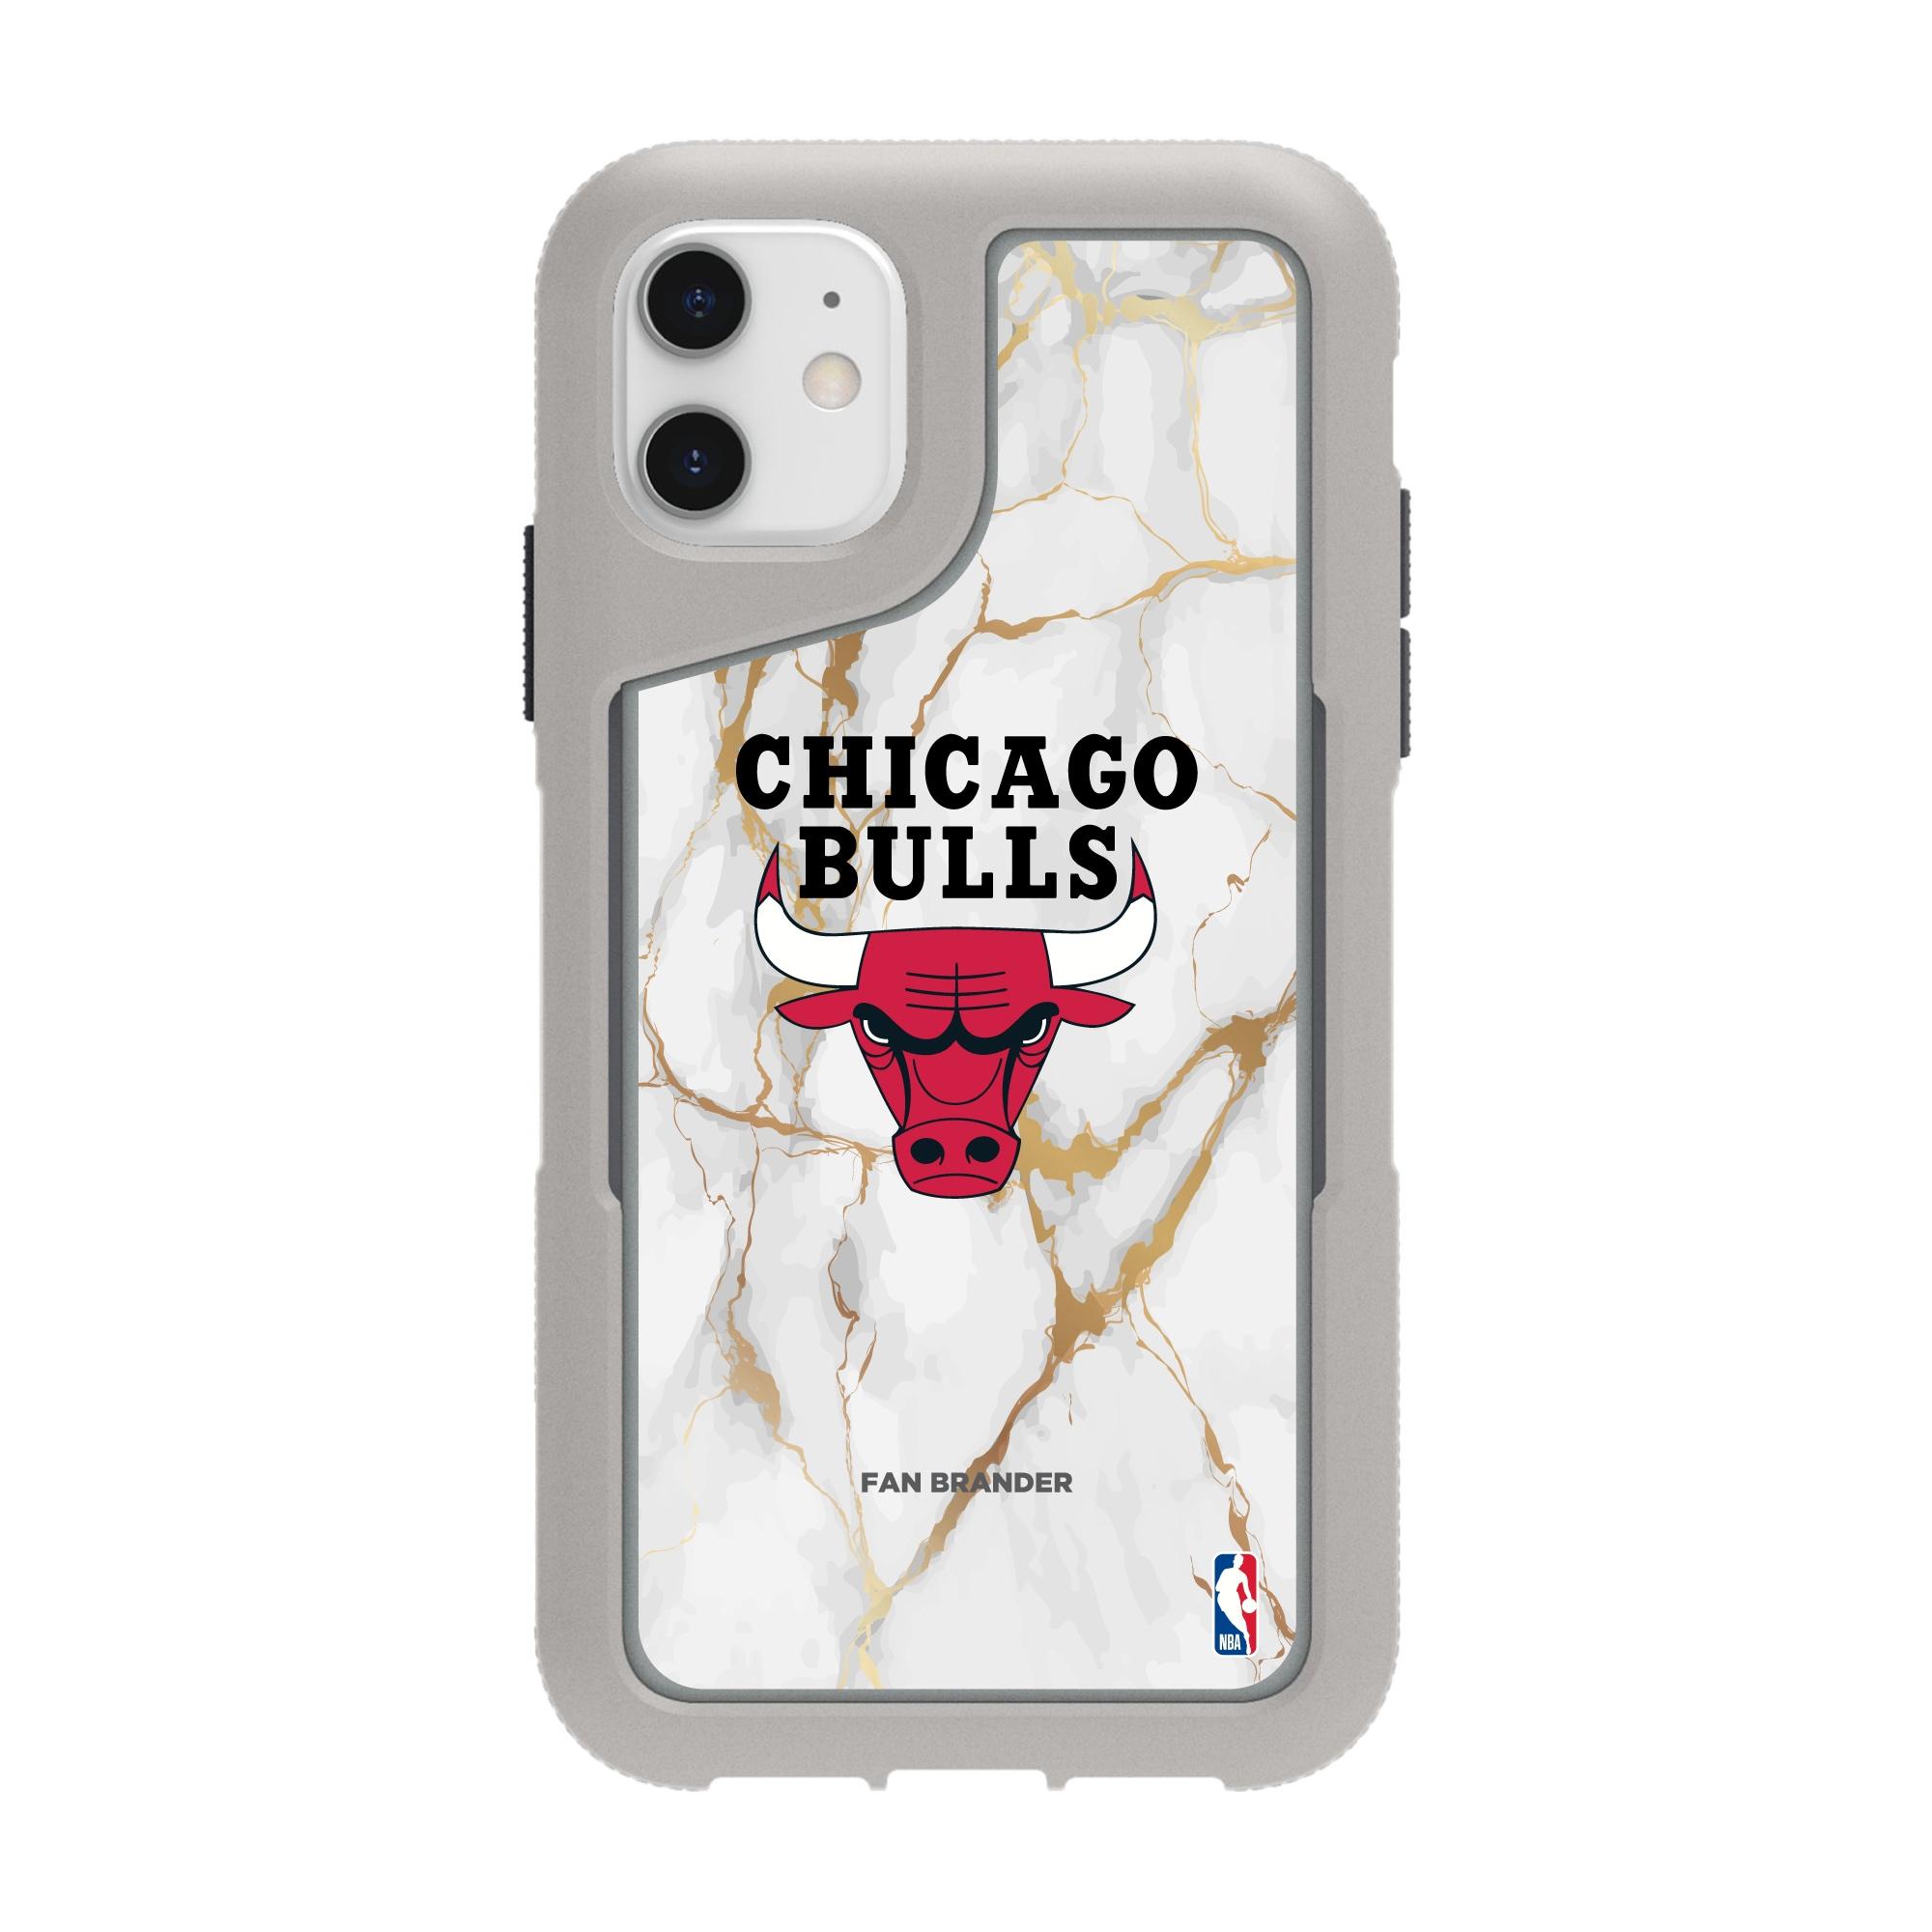 Chicago Bulls Griffin Survivor Endurance Marble iPhone Case - Gray